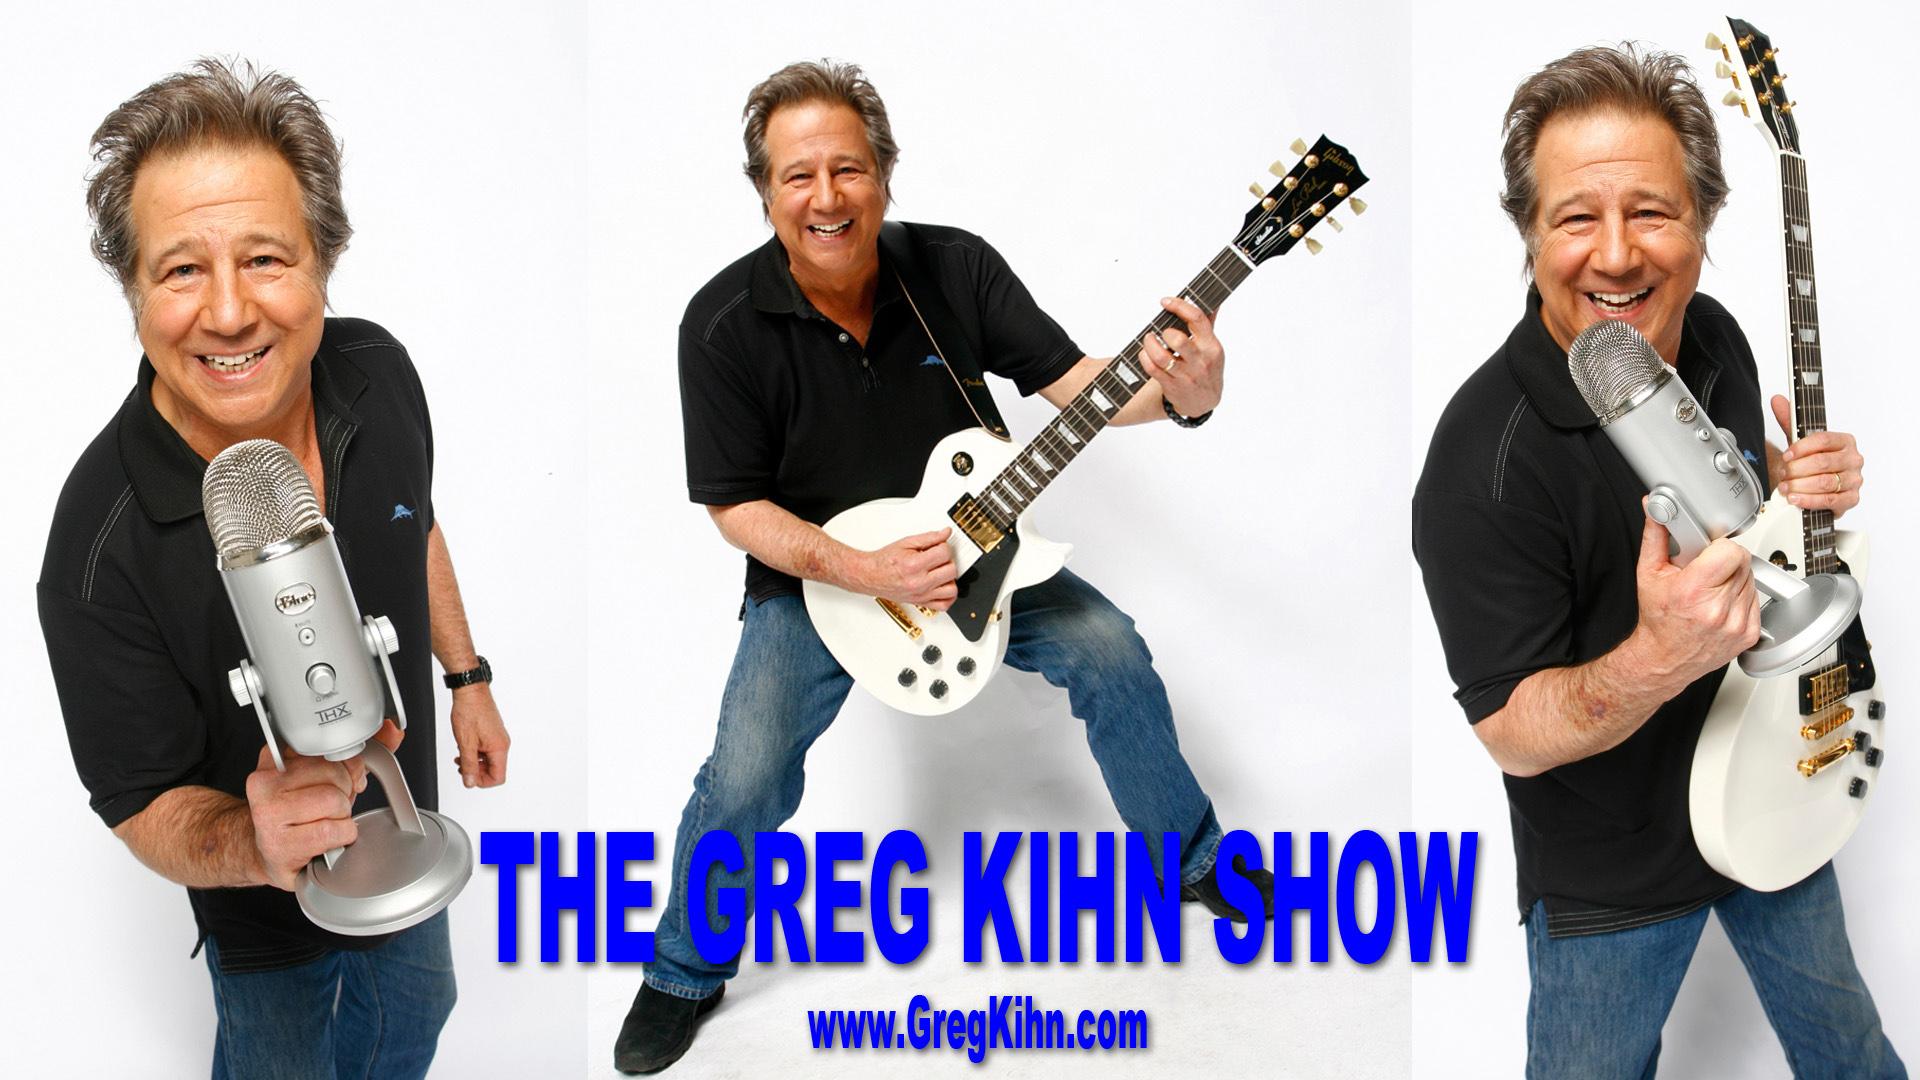 Ep. 40 The Greg Kihn Show – In The Studio Working on a New Greg Kihn Album